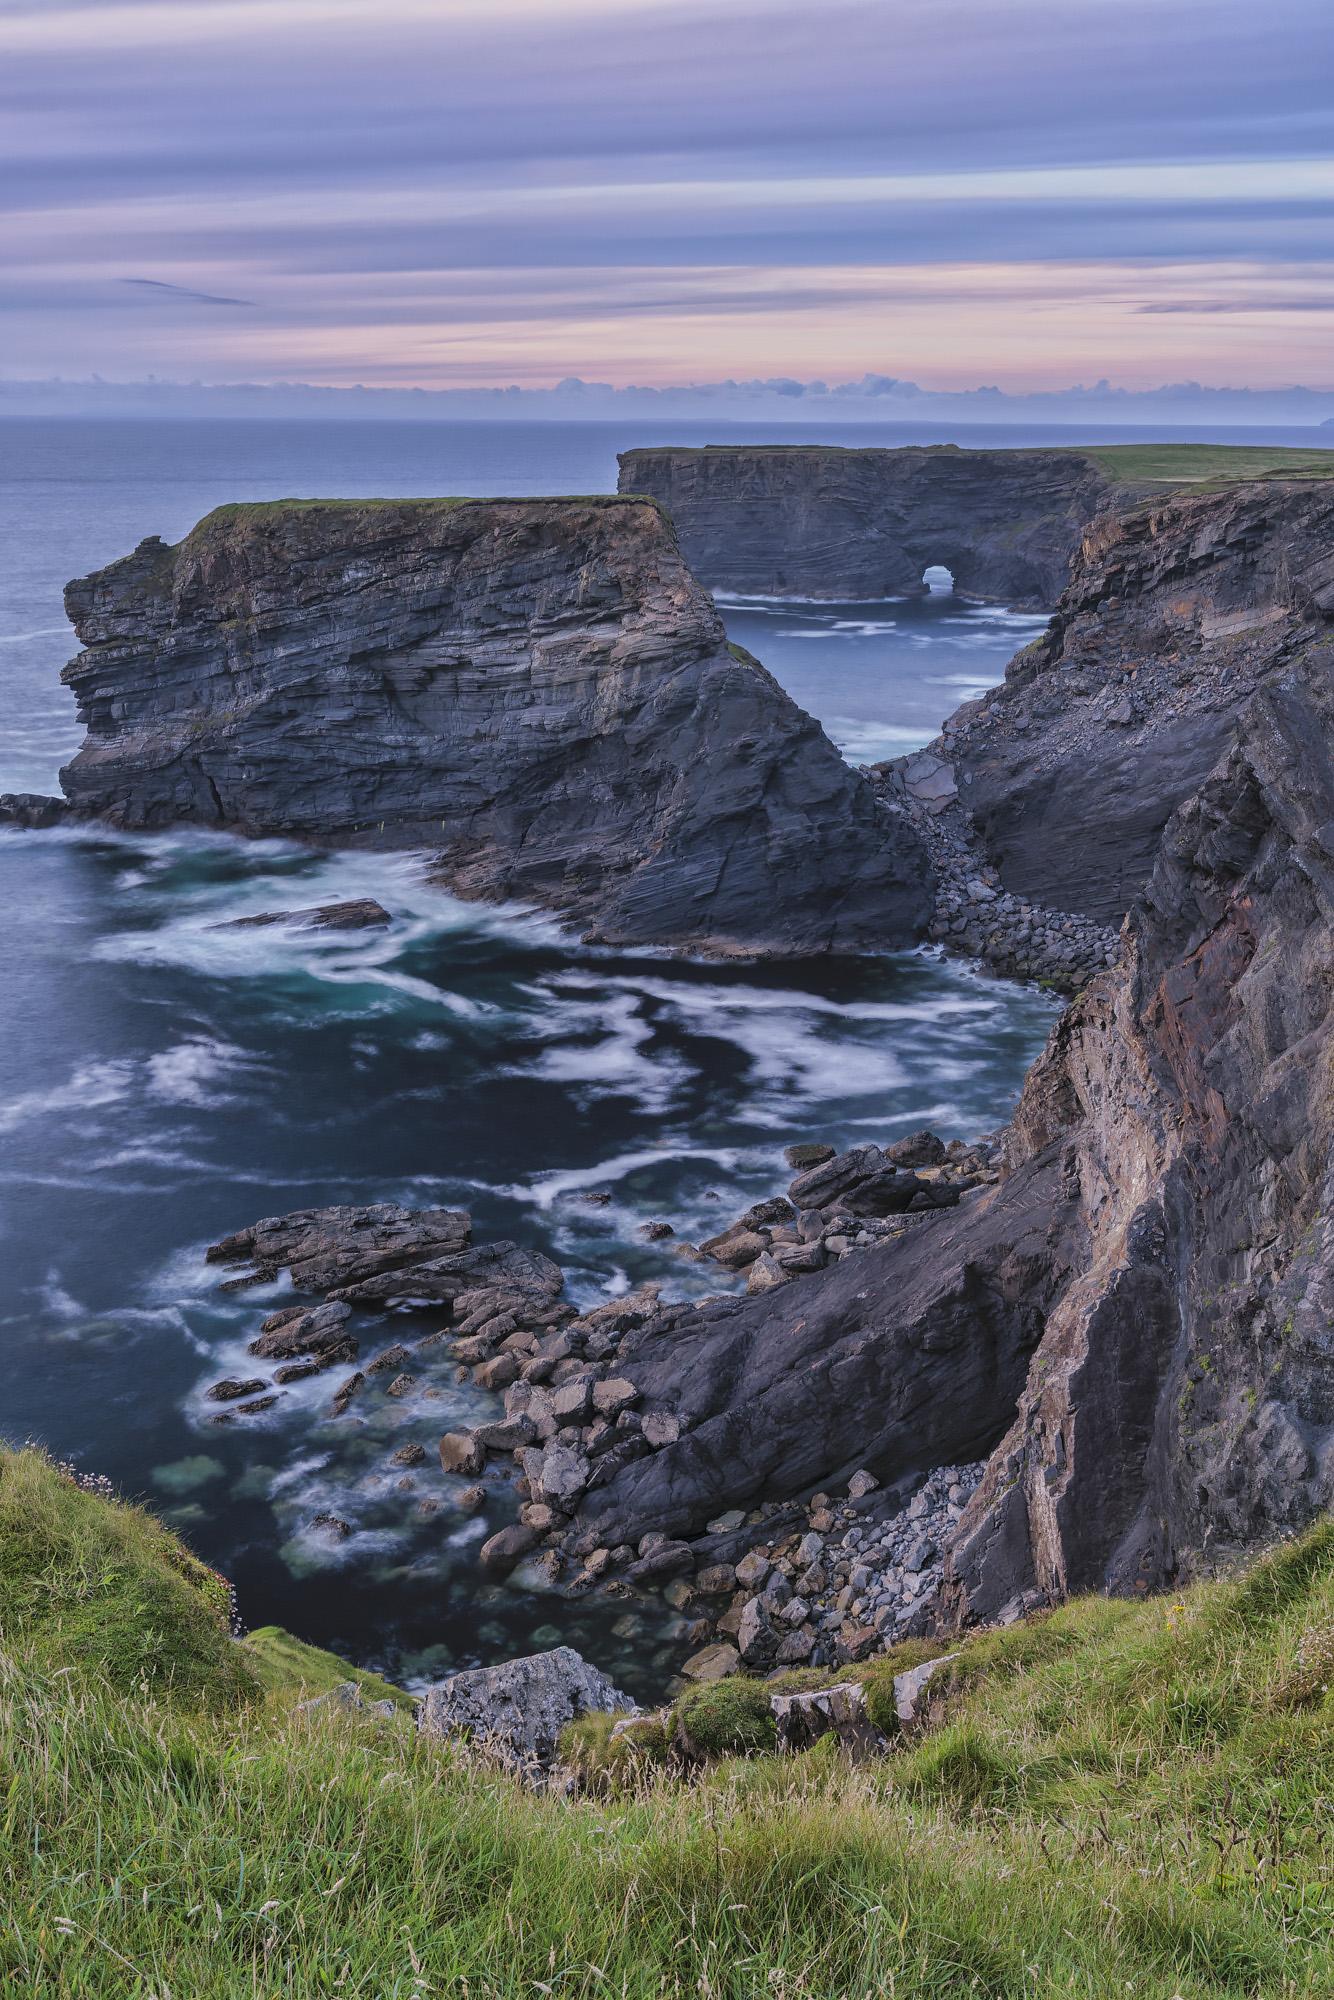 Illaunadoon, Loop Head, Co. Clare, Ireland. Sony A7R II, Sony 24-70 f/2.8 GM at 35mm, ISO 50, 13s at f/16. Tripod. August. © Carsten Krieger